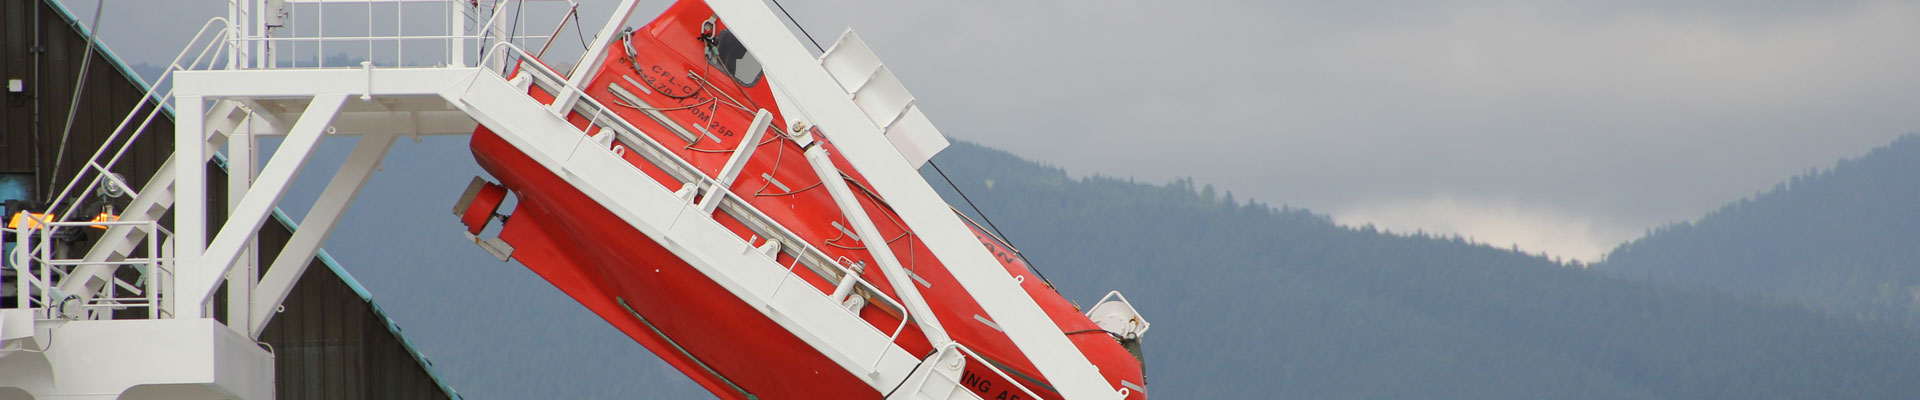 Freefall boat